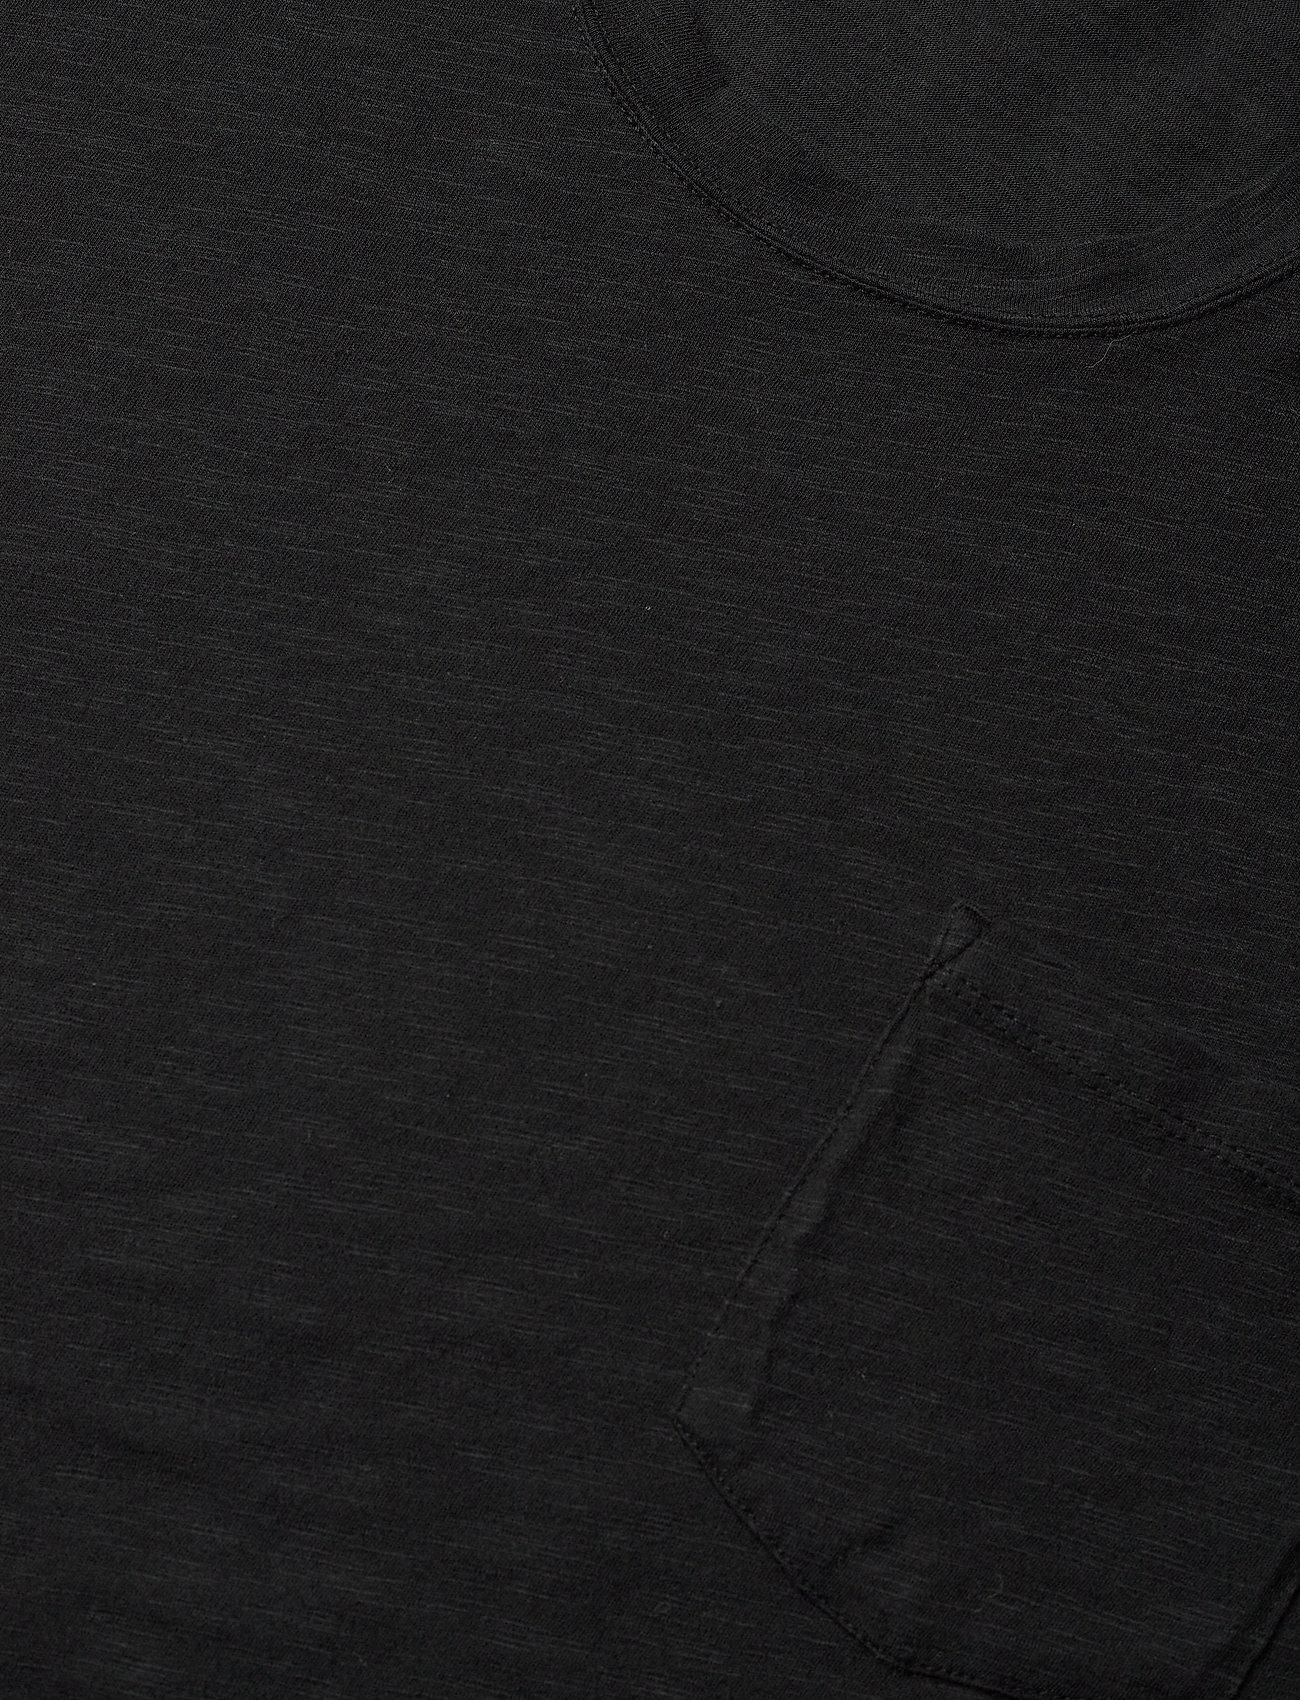 Zadig & Voltaire - STOCKHOLM COTTON SLUB - basic t-shirts - black - 3